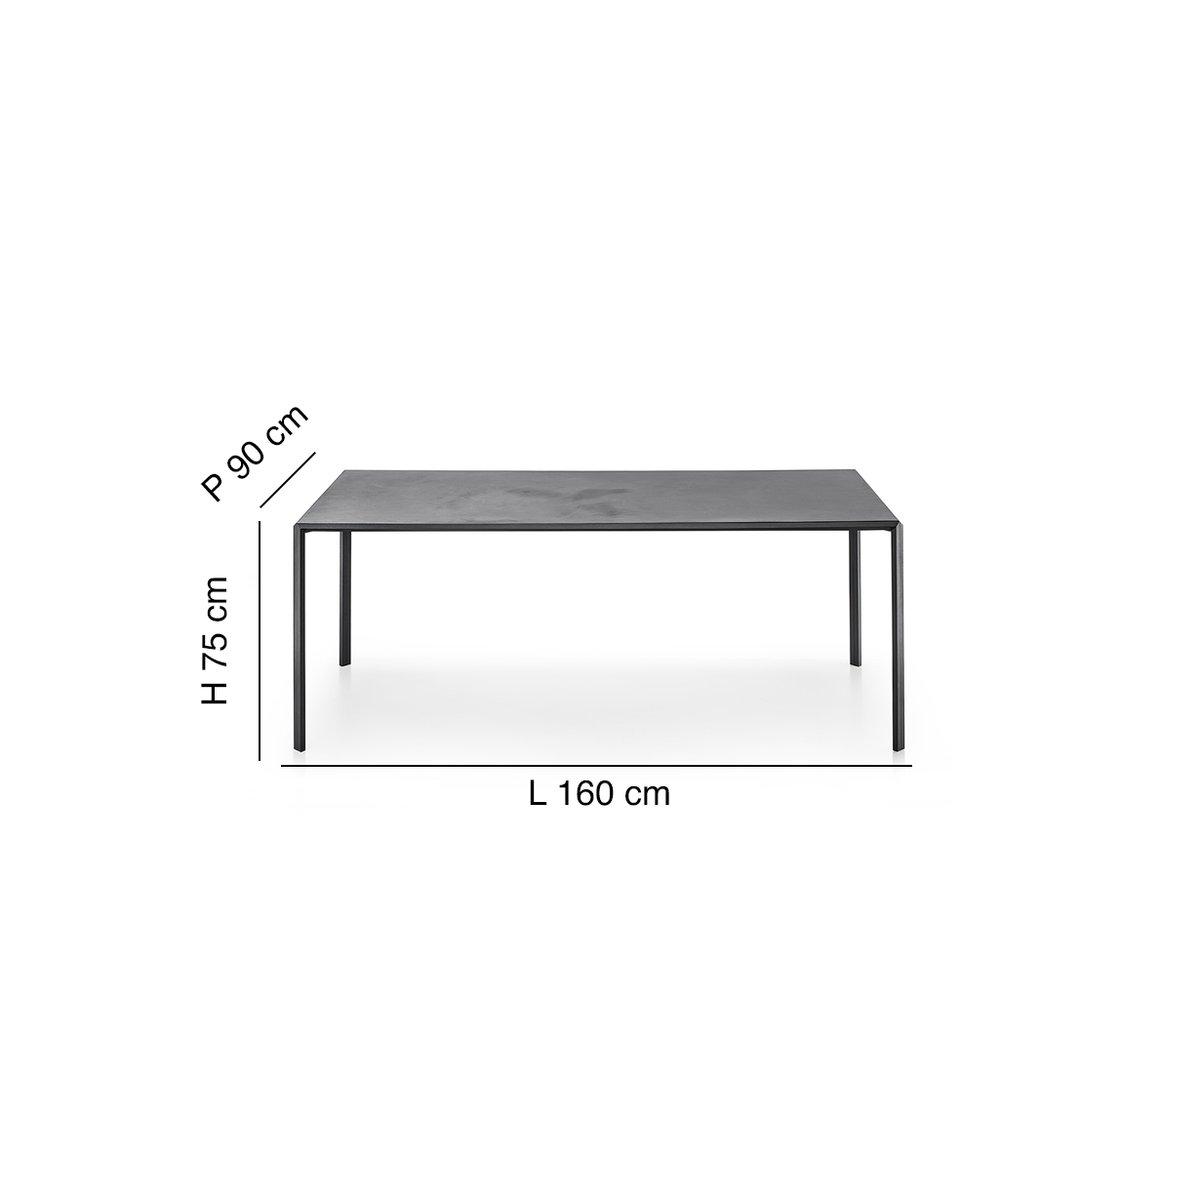 Tavolo rettangolare dueperdue 90x160 by infiniti design for Tavolo rettangolare design